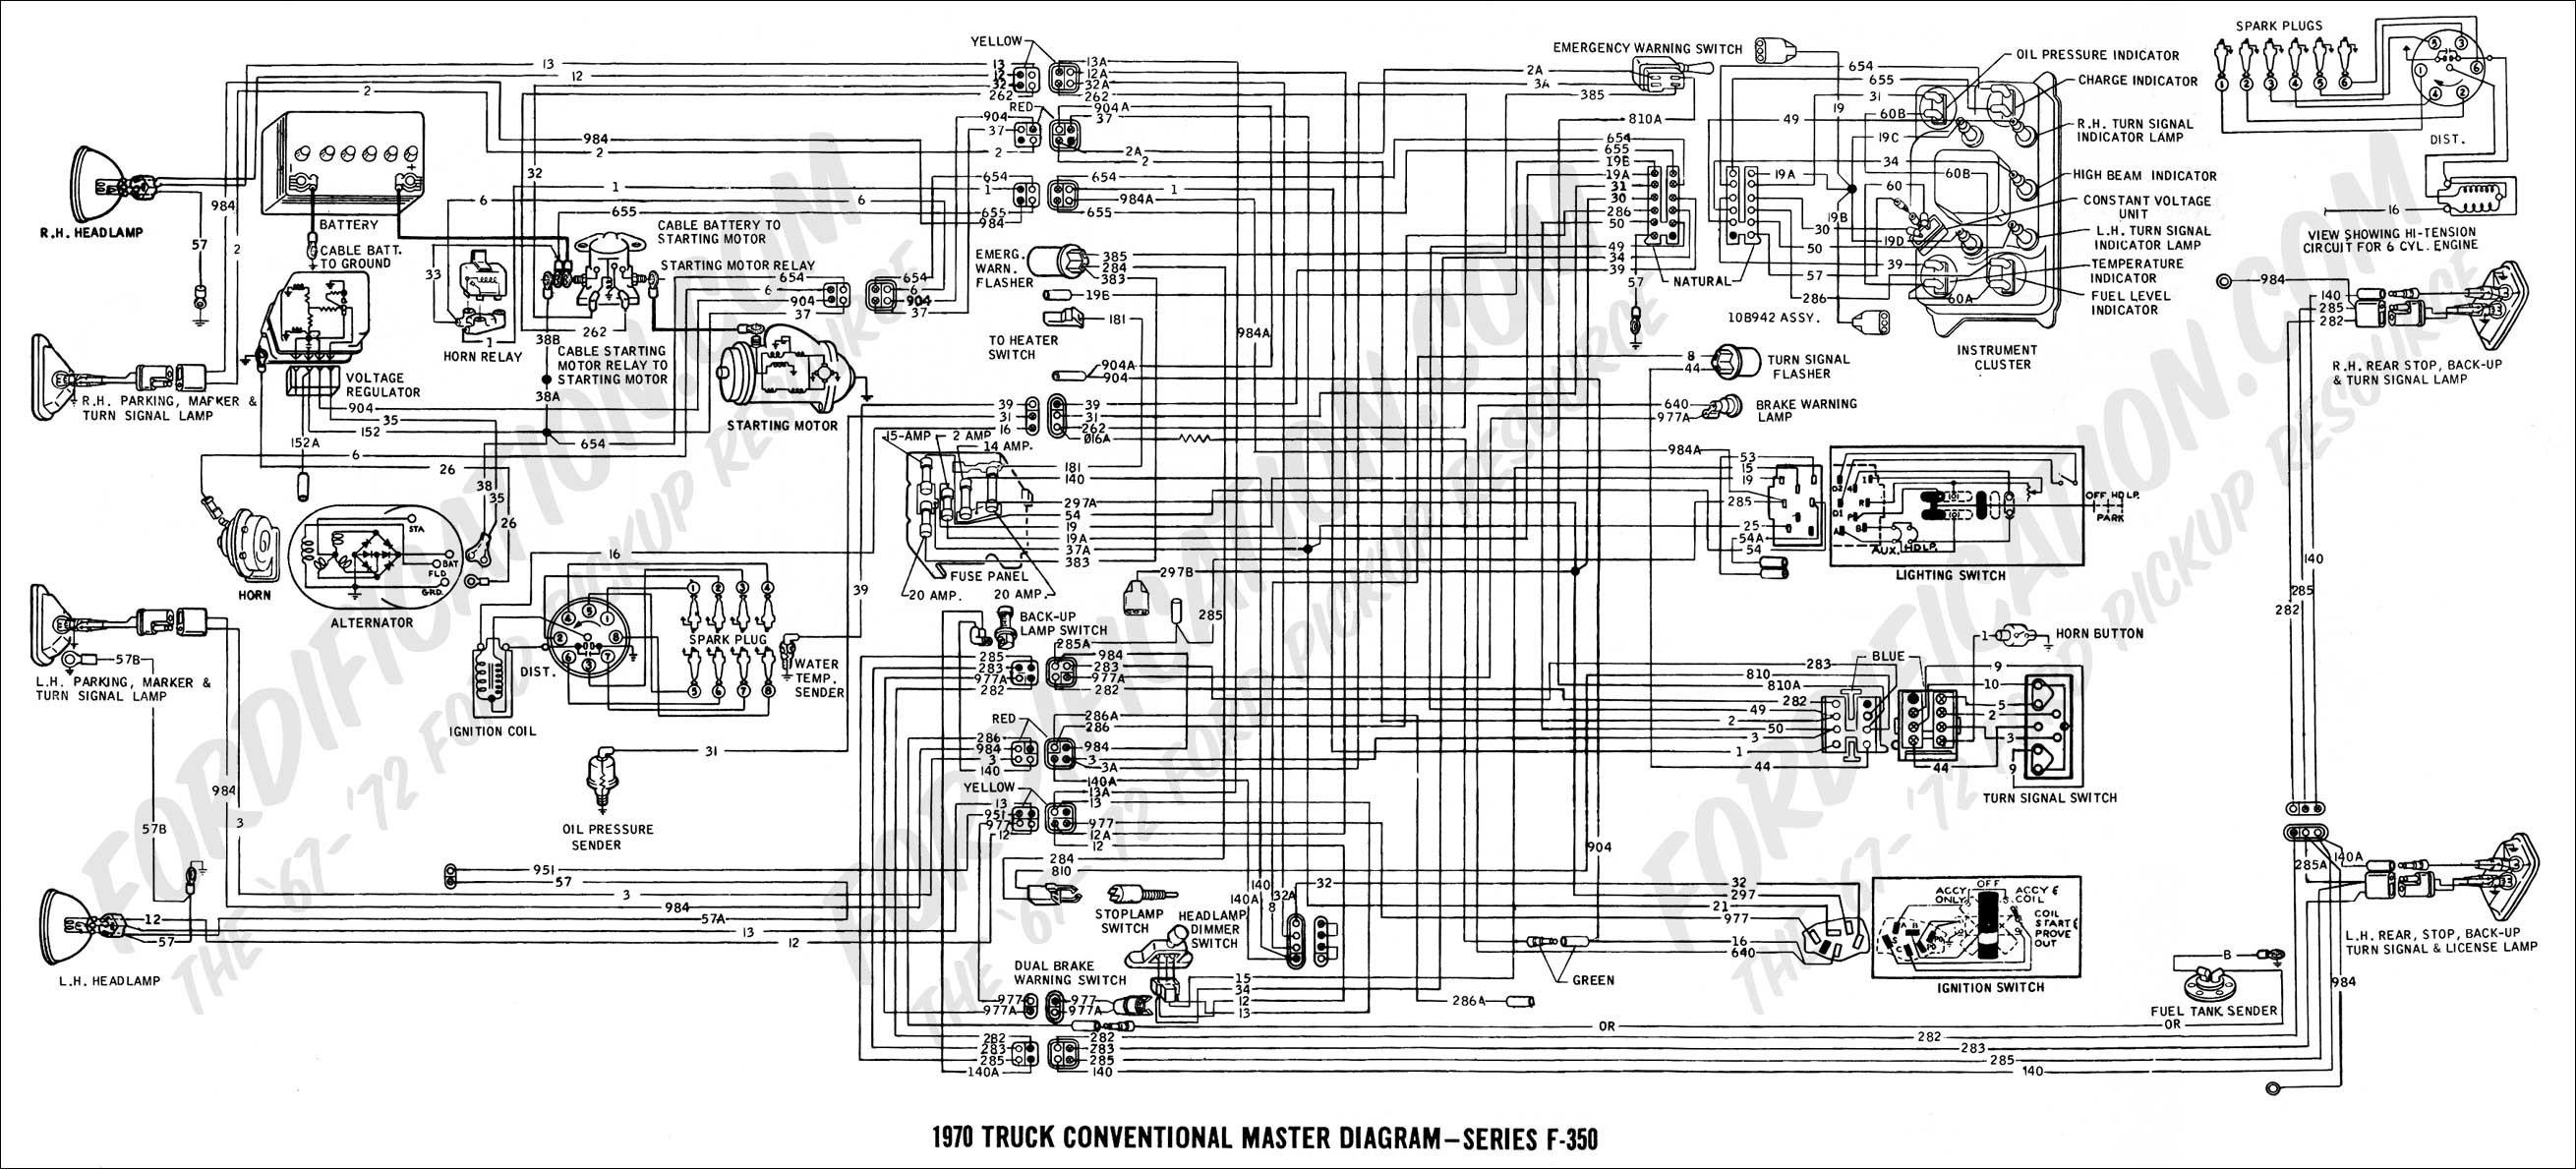 V8 Engine Parts Diagram 1997 7 3l Engine Diagram Experts Wiring Diagram • Of V8 Engine Parts Diagram